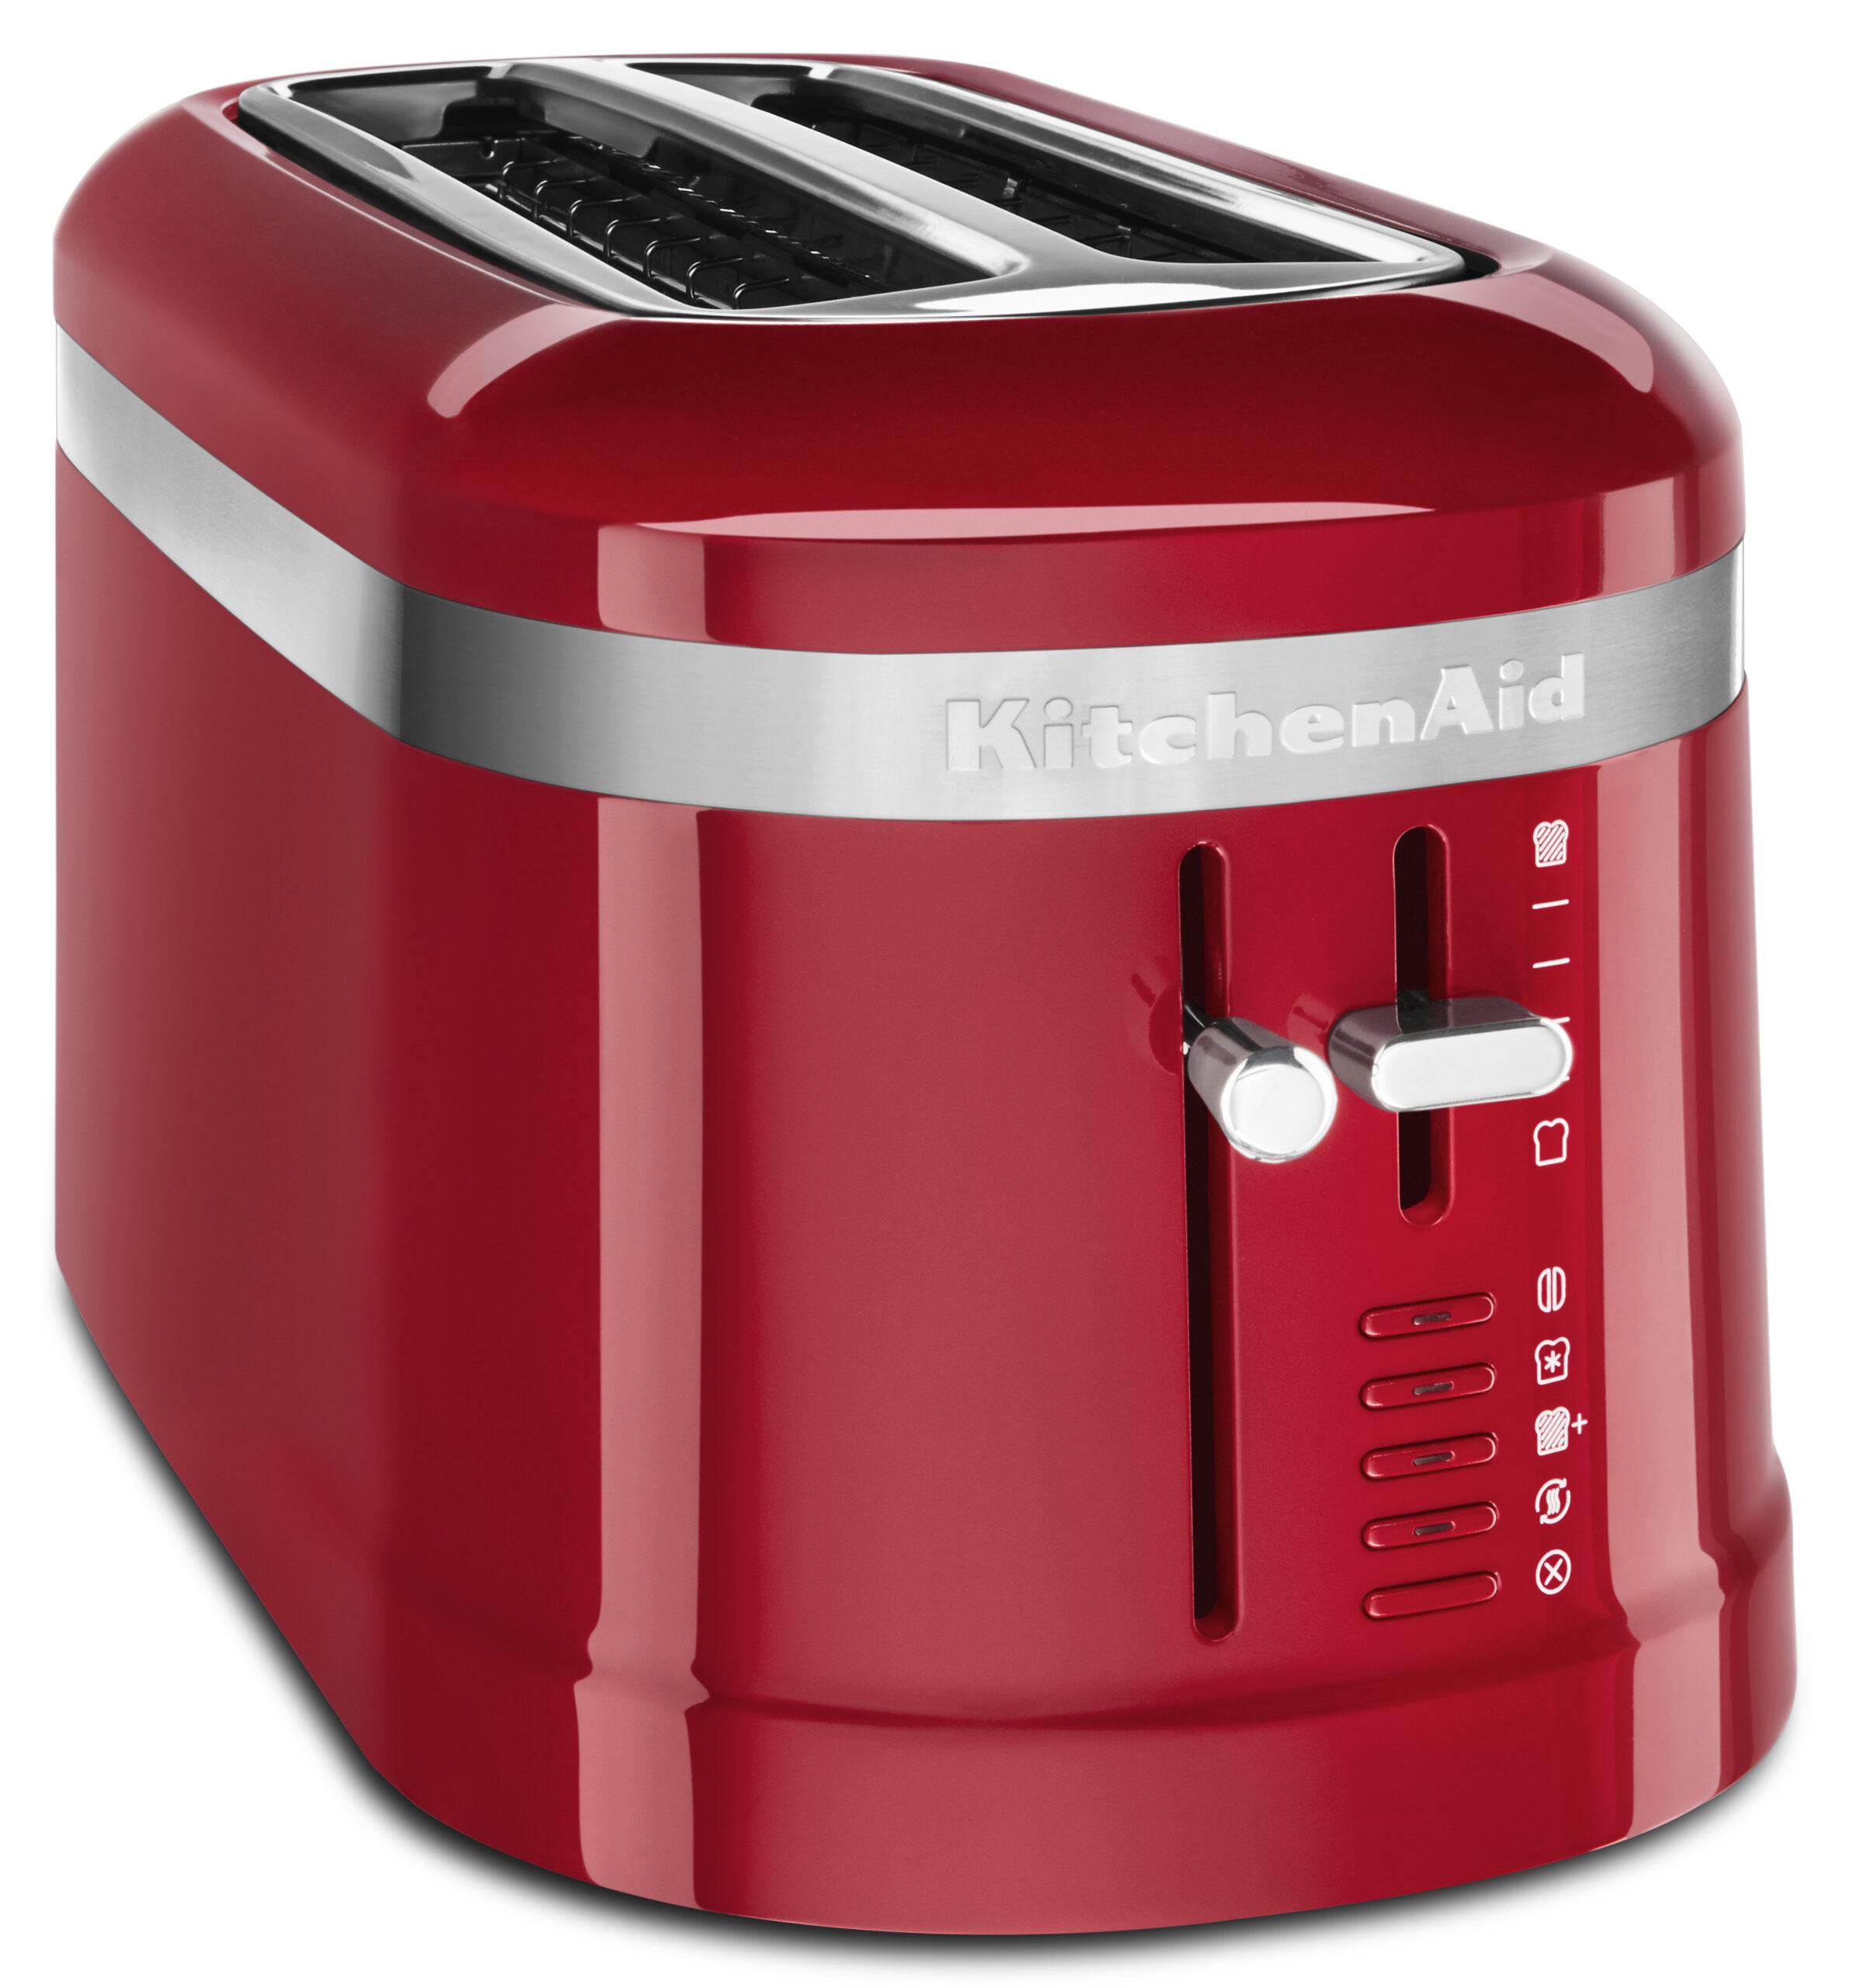 KitchenAid Toaster Long Slot 4 Slice (5KMT5115BER)